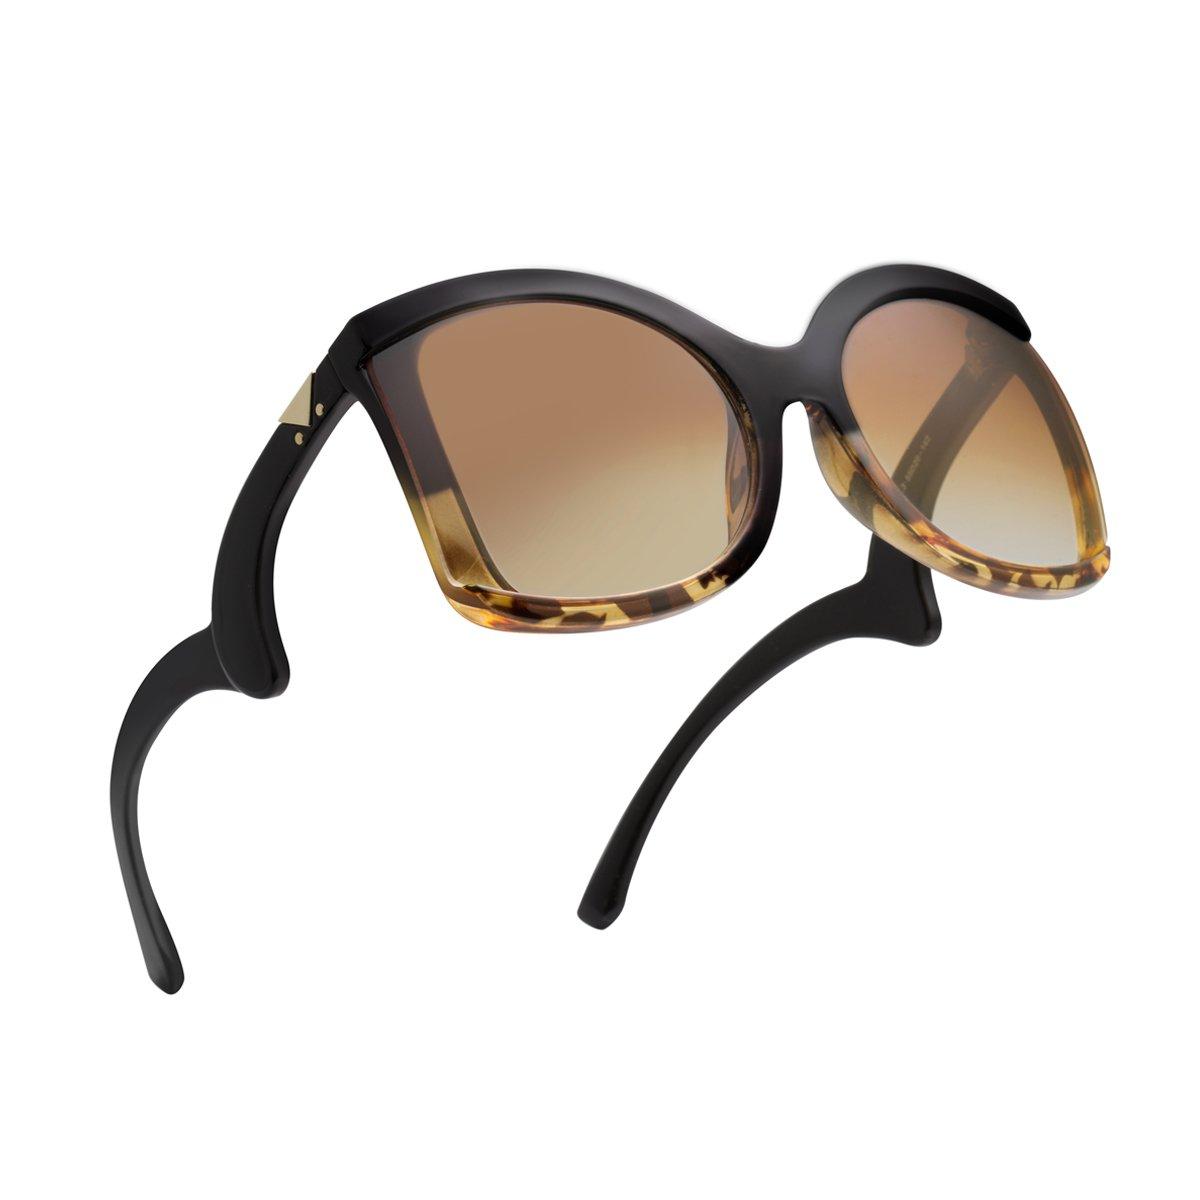 cb20c330da ... Women RAYSUN Oversized Square Sunglasses Multi Tinted Frame Fashion  Modern Shades 100% UV Protection Eyewear. Wholesale Price 9.99. Composite  frame